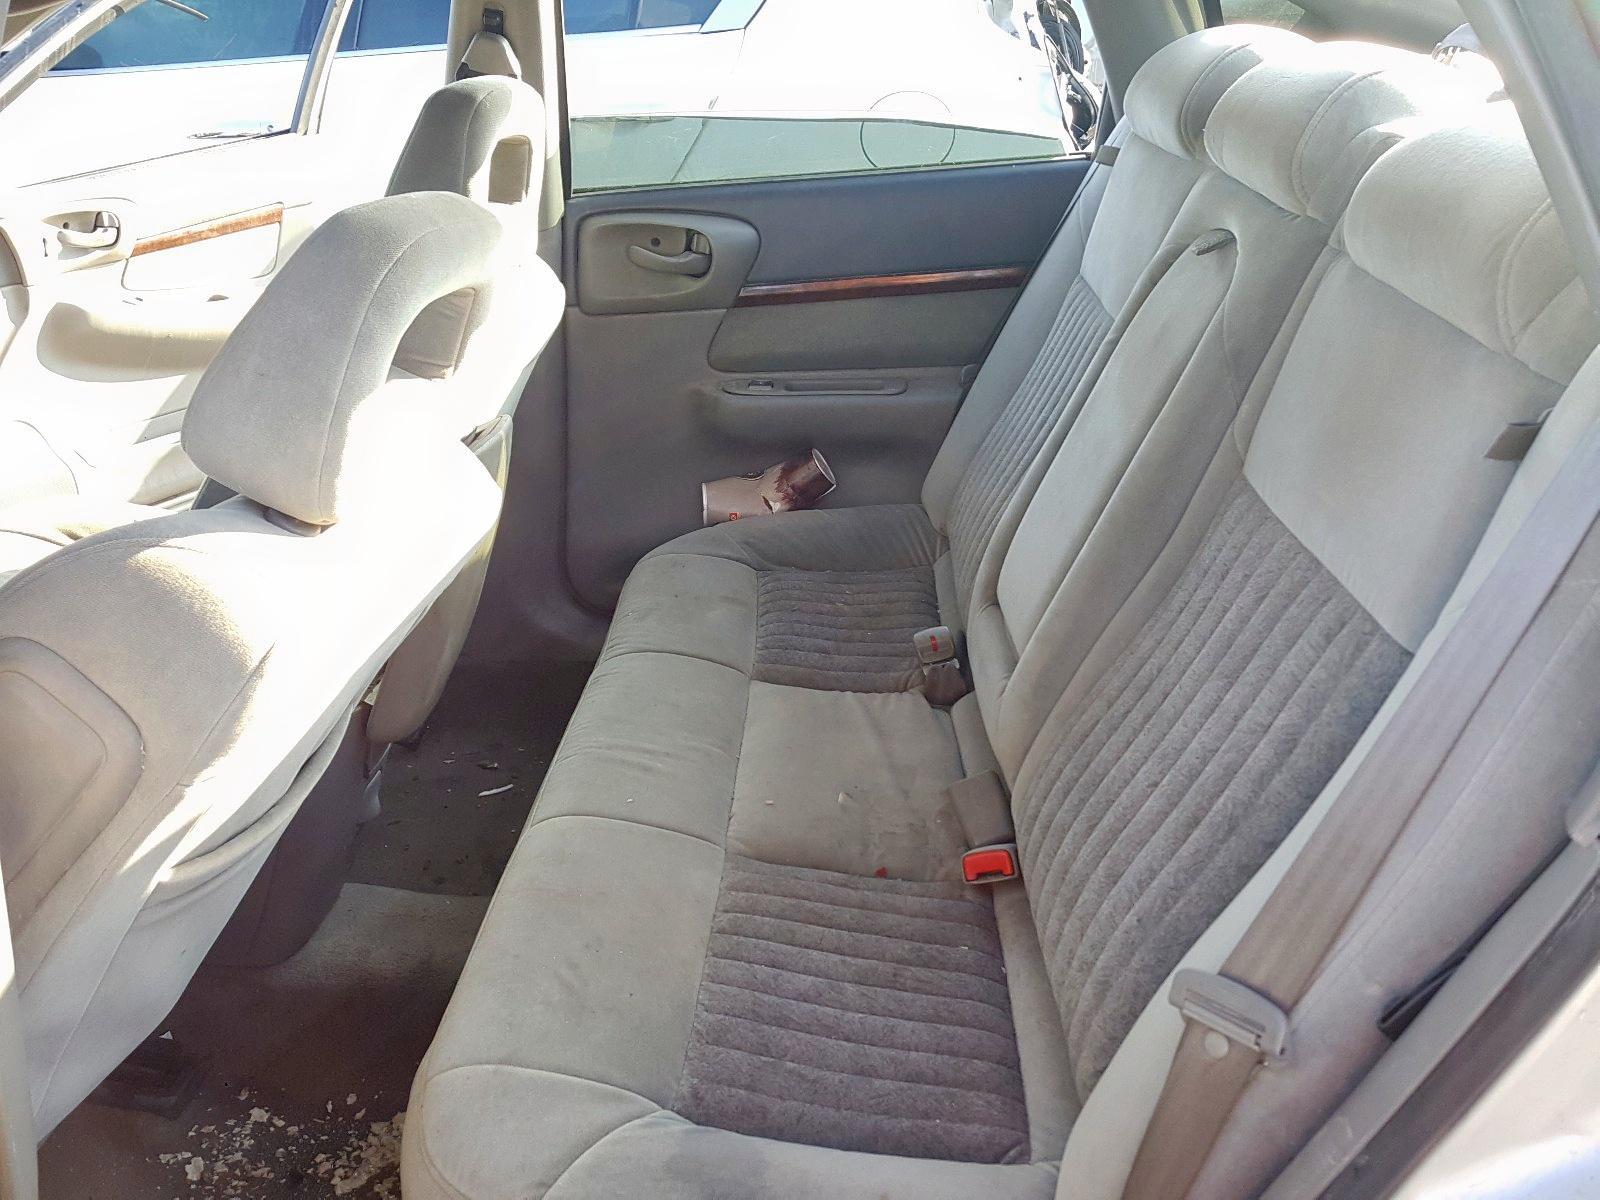 2000 Chevrolet Impala Ls 3.8L detail view